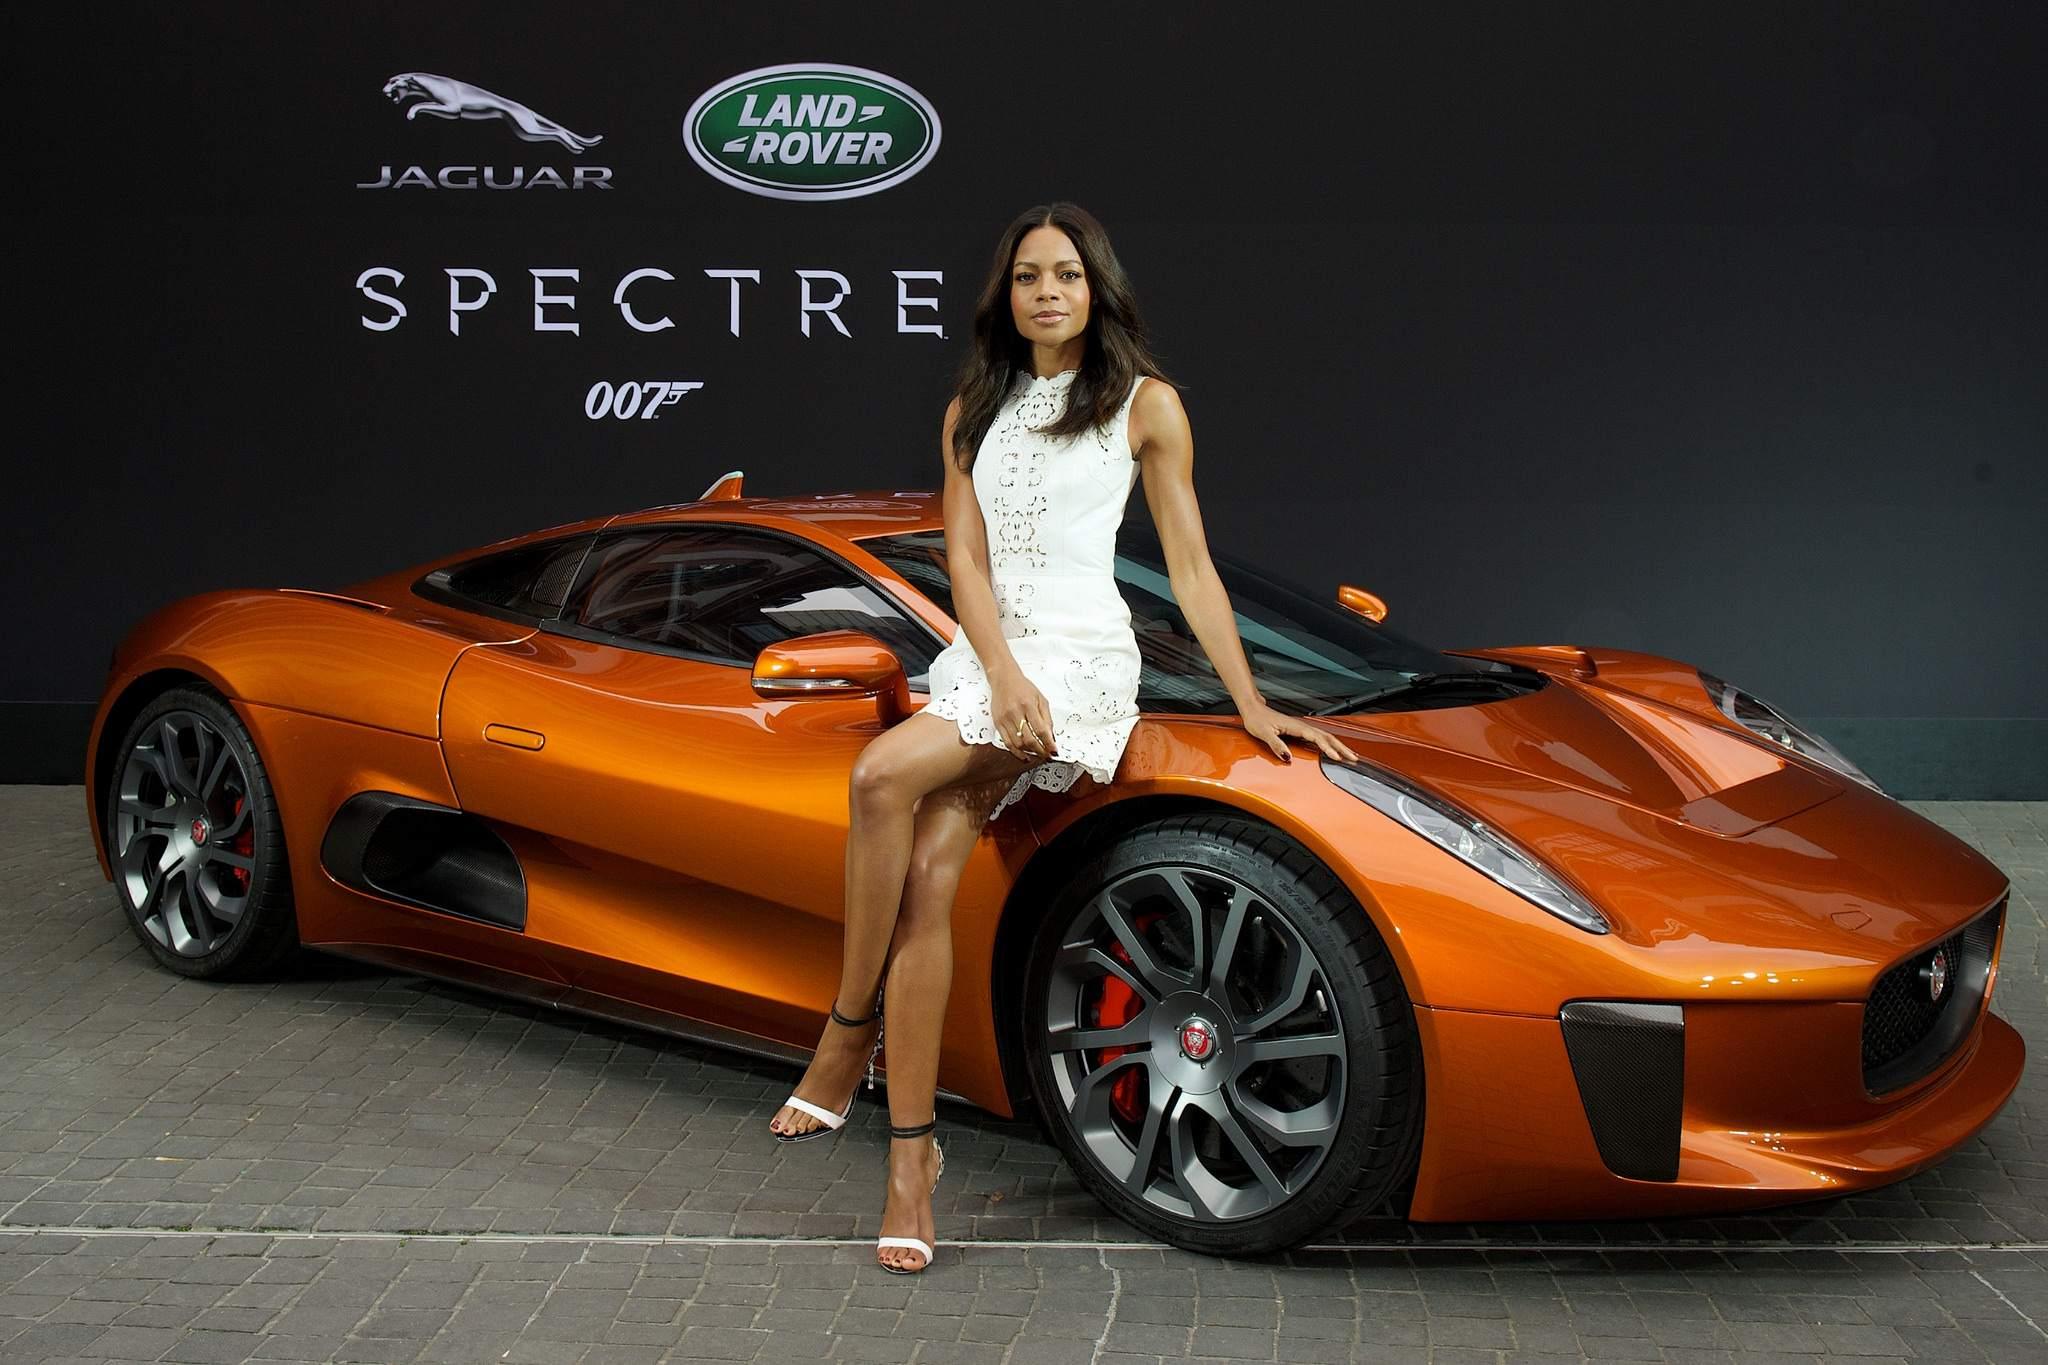 spectre car2 Jaguar Land Rover Latest Bond Cars